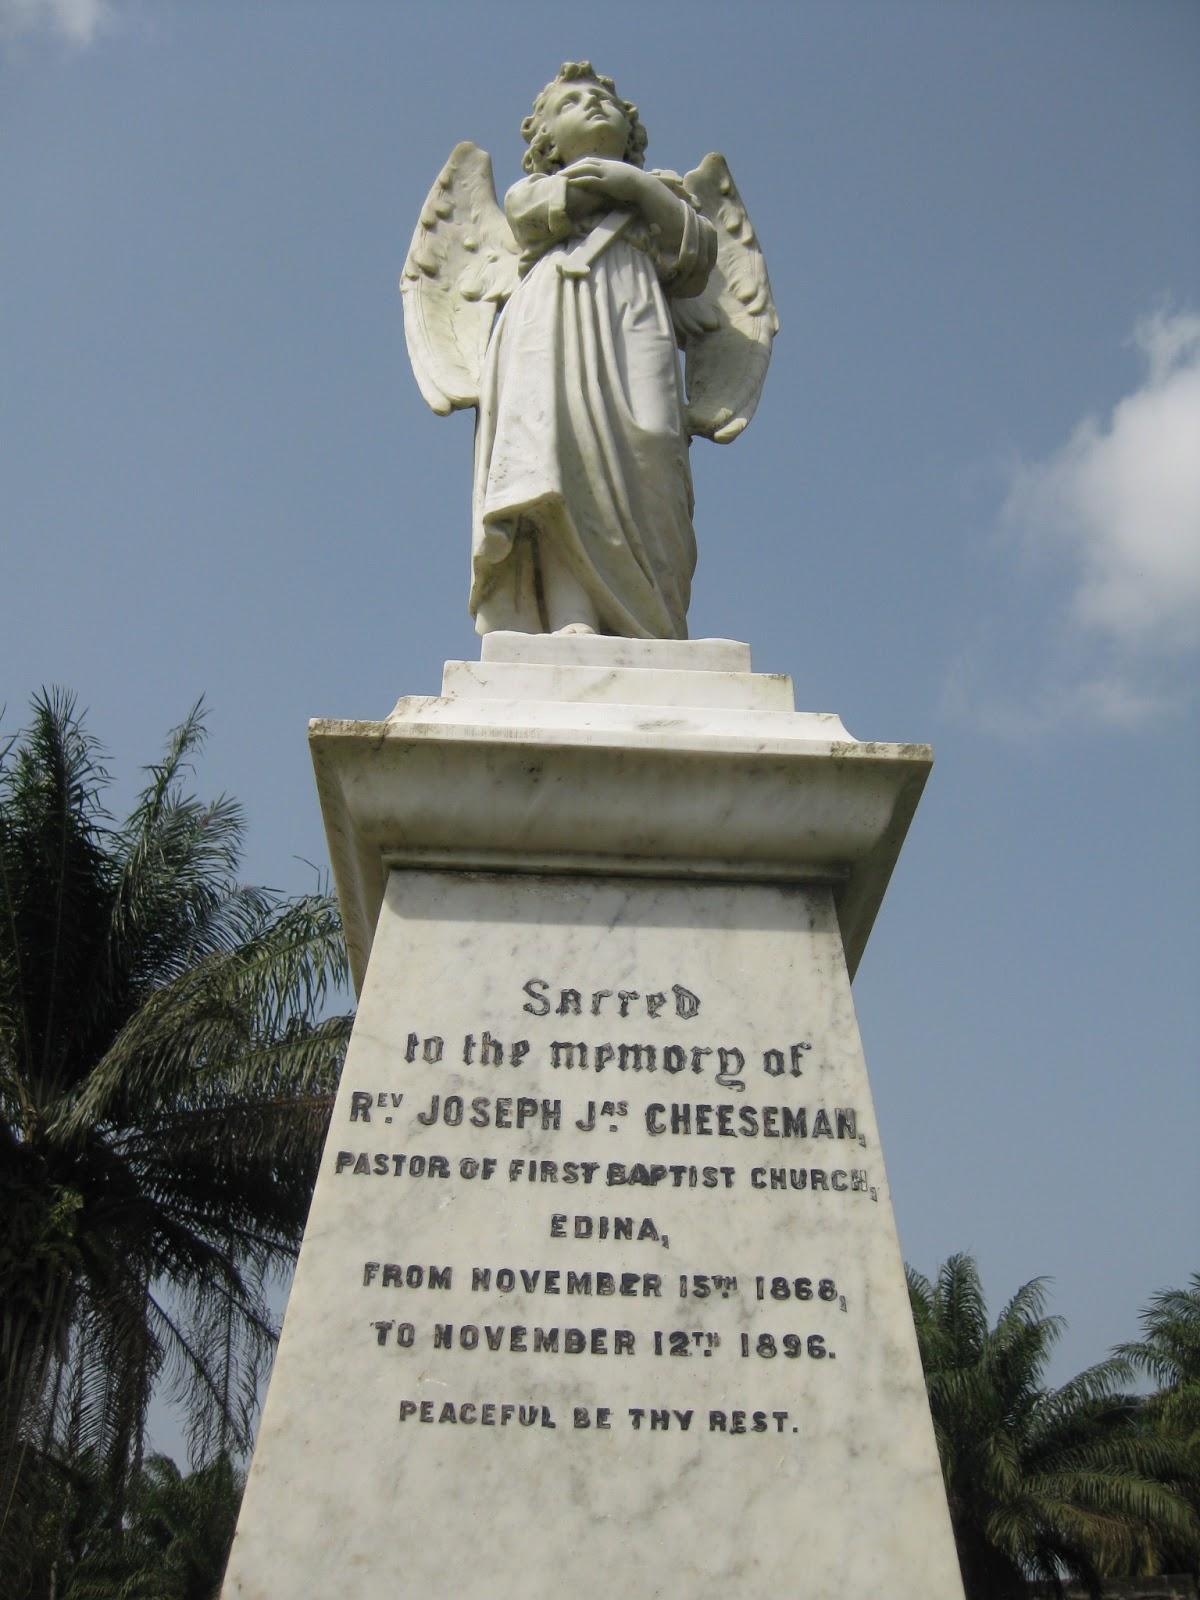 Revisiting Liberia: On the Edina Road: Part I